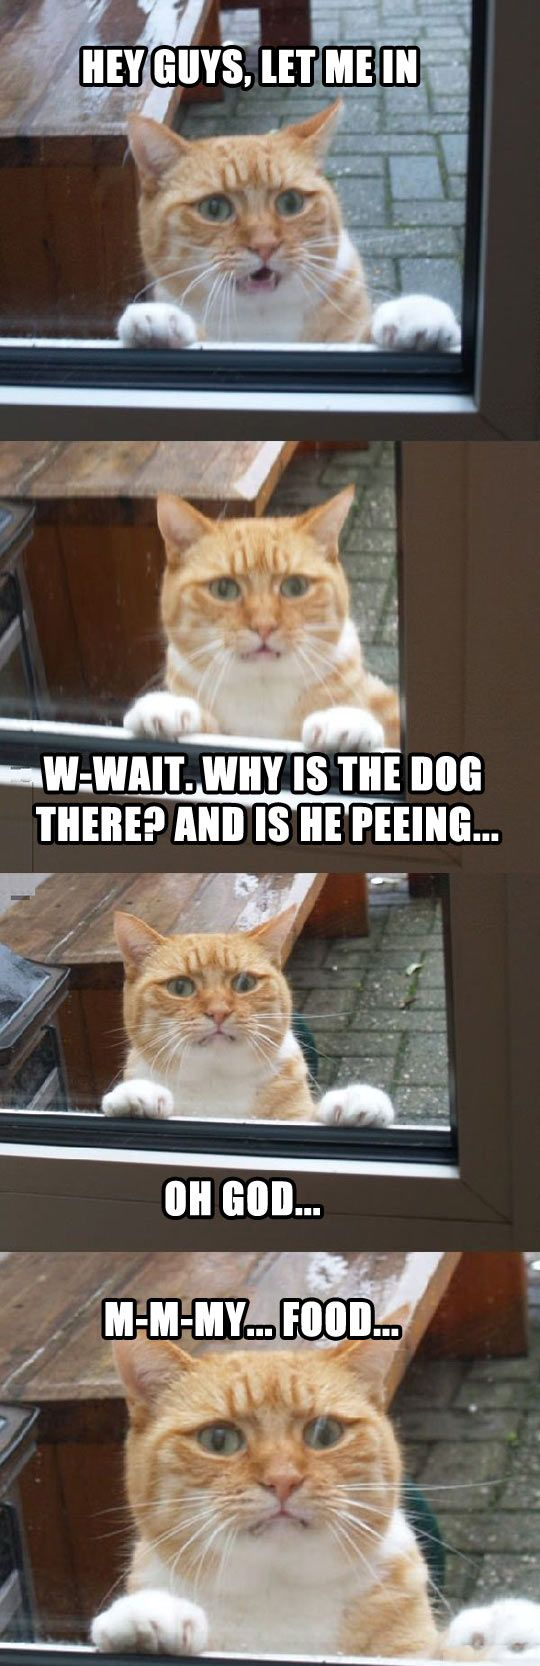 outside cat: